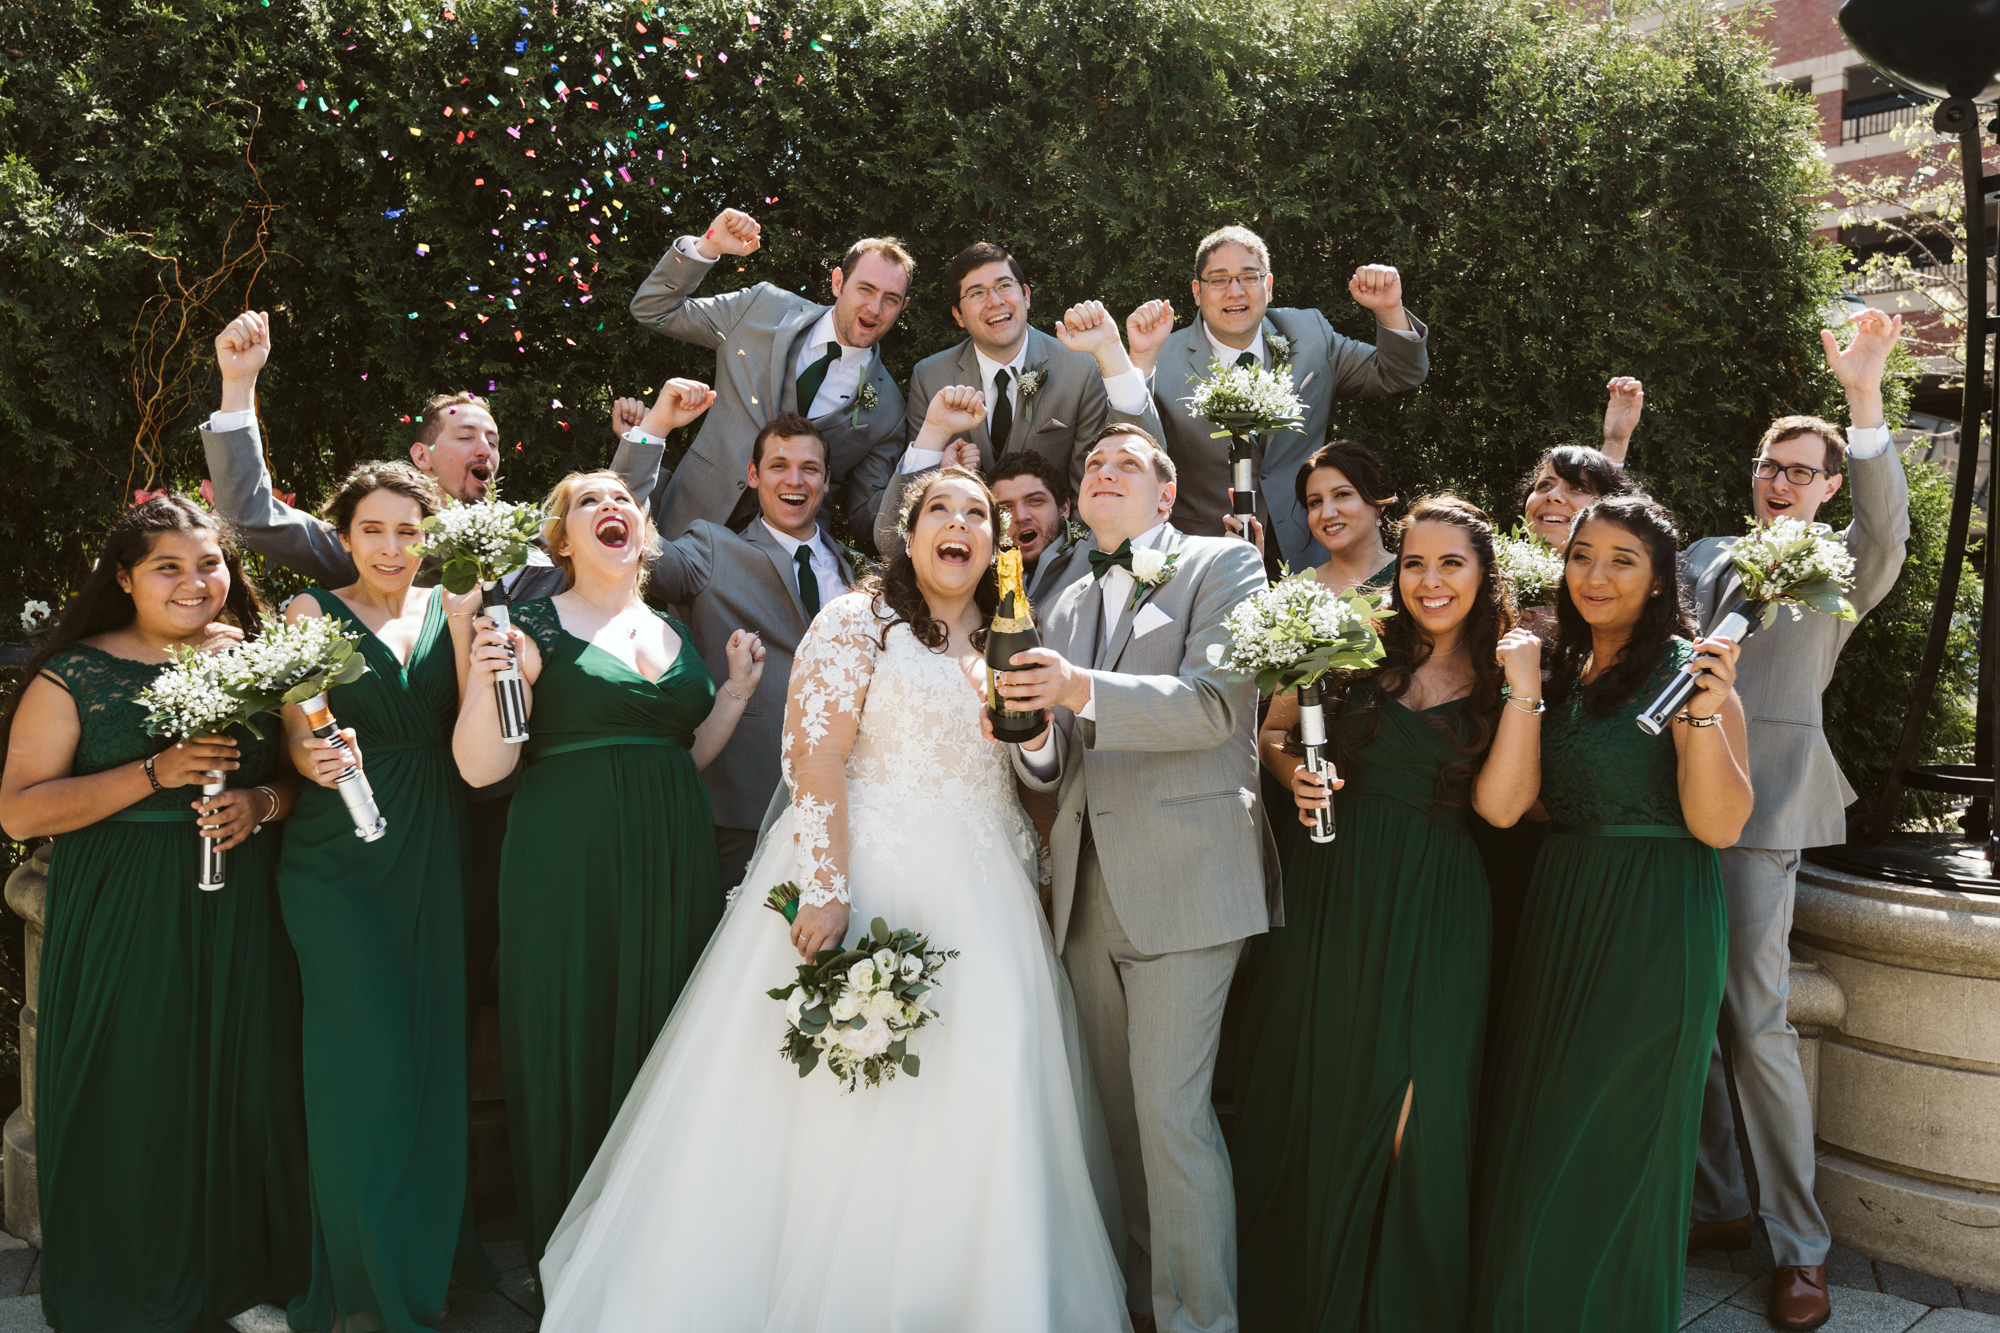 arlington-heights-wedding-jessica-matthew-20415